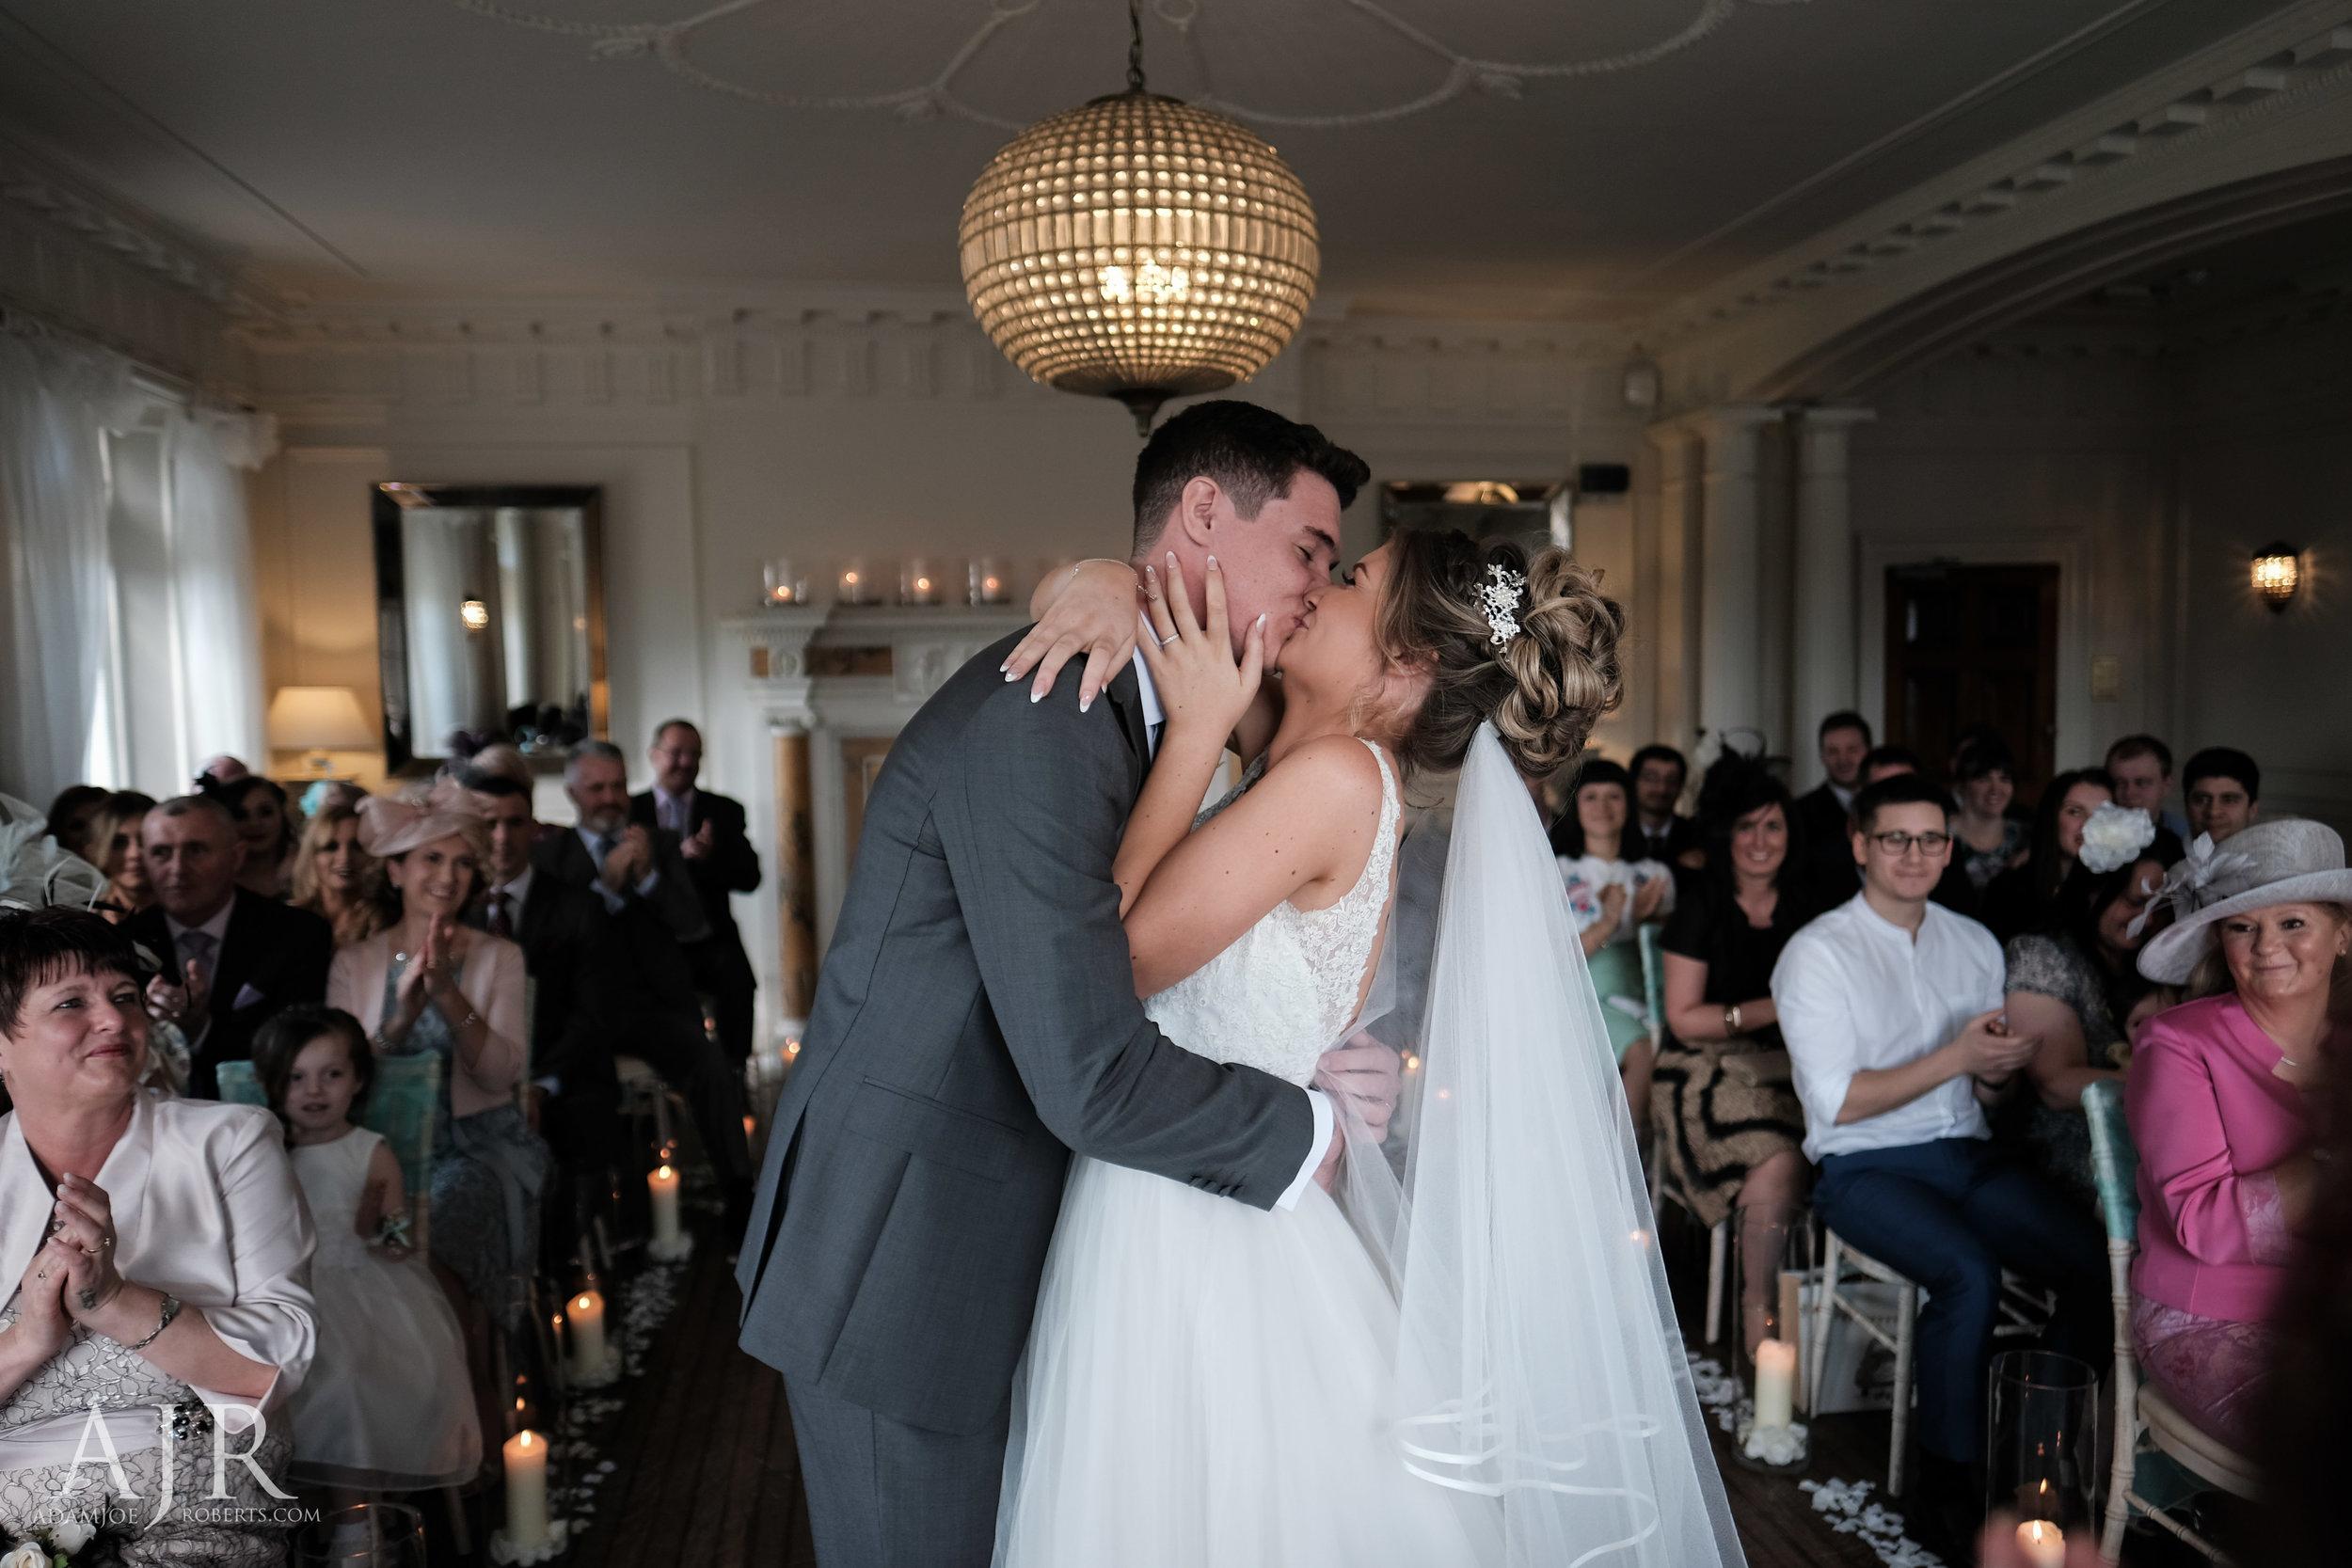 Eaves hall documenrty wedding photography | widnes cheshire wedding photographer sneak peek (5 of 11).jpg